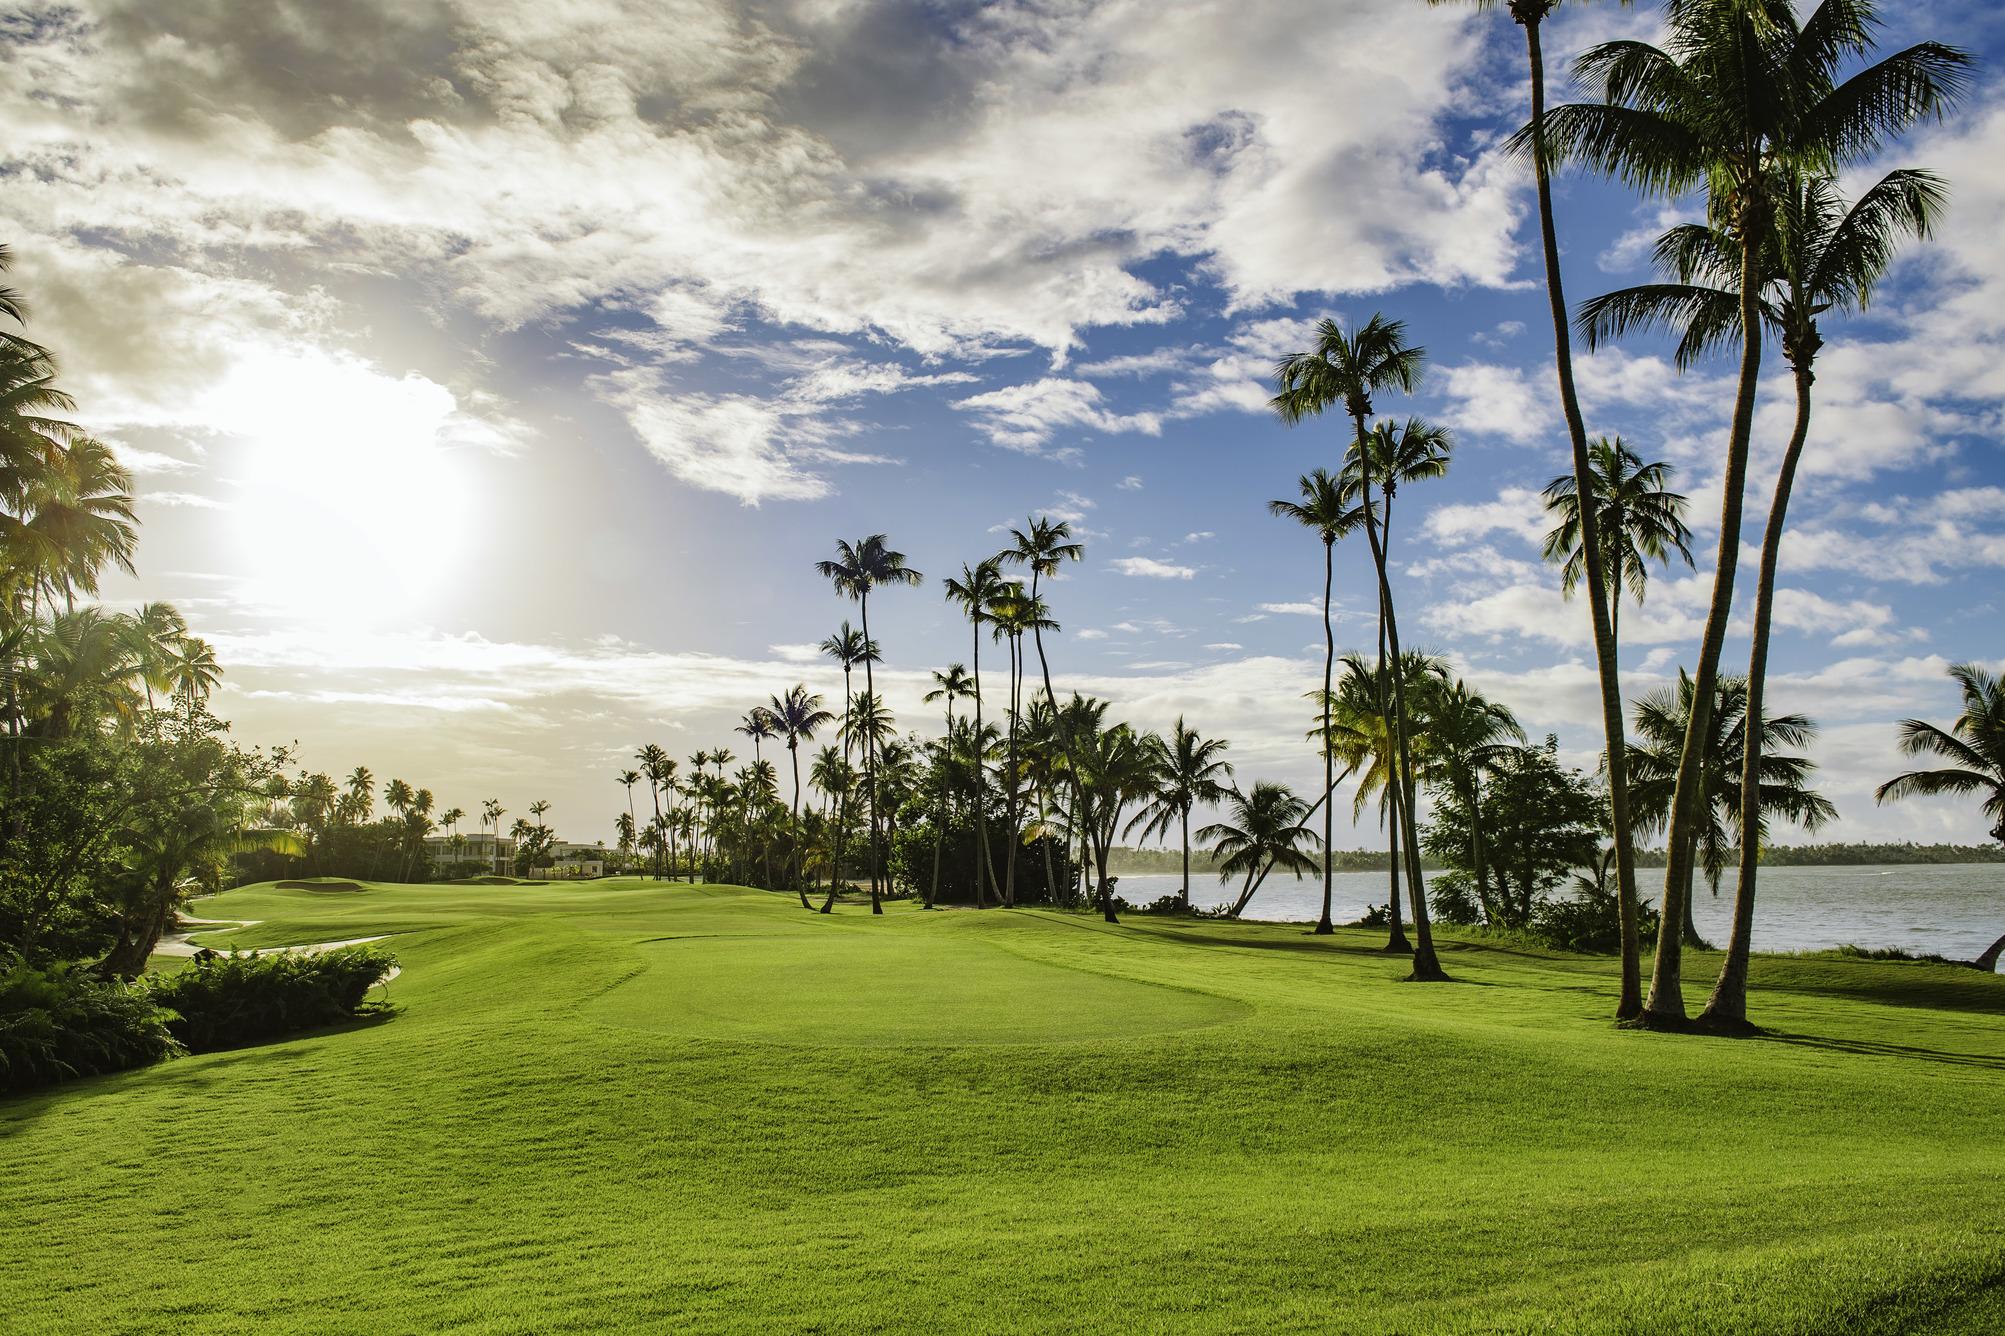 luxury, resort, golf course, Puerto Rico, beaches